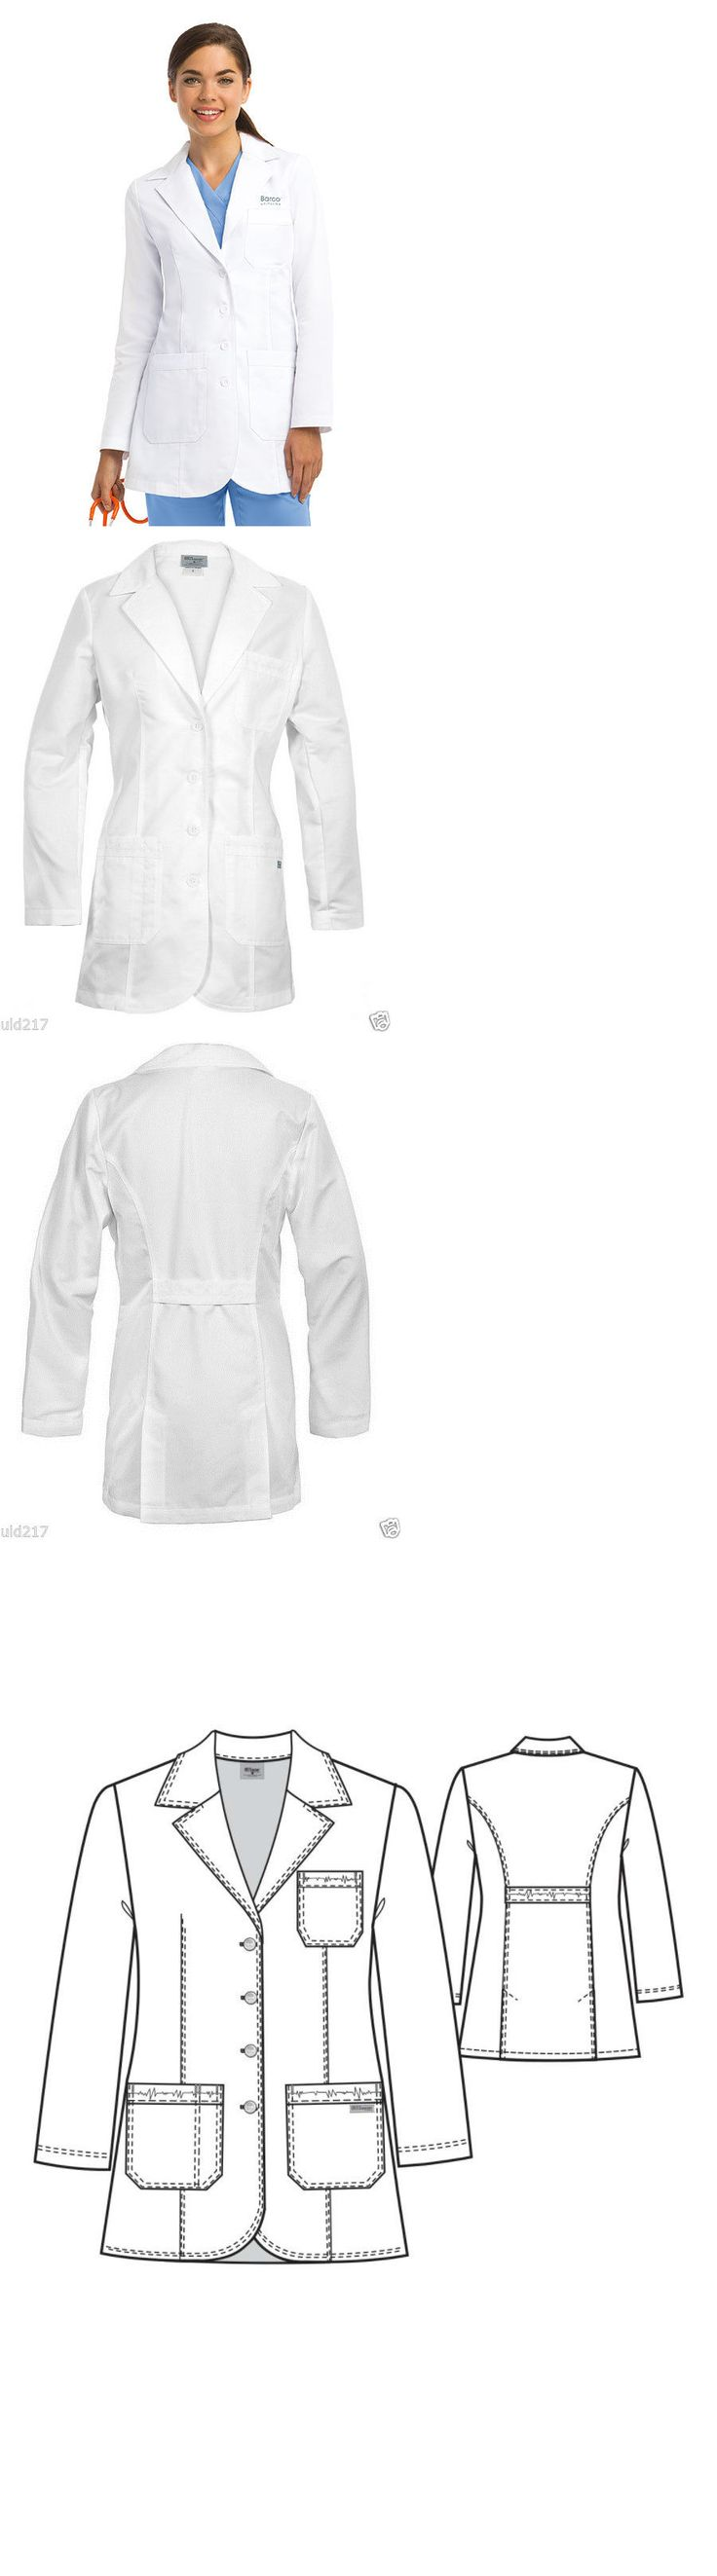 White apron for lab - Lab Coats 105417 Grey S Anatomy Womens 32 Inch White Lab Coat 4425 Nwt